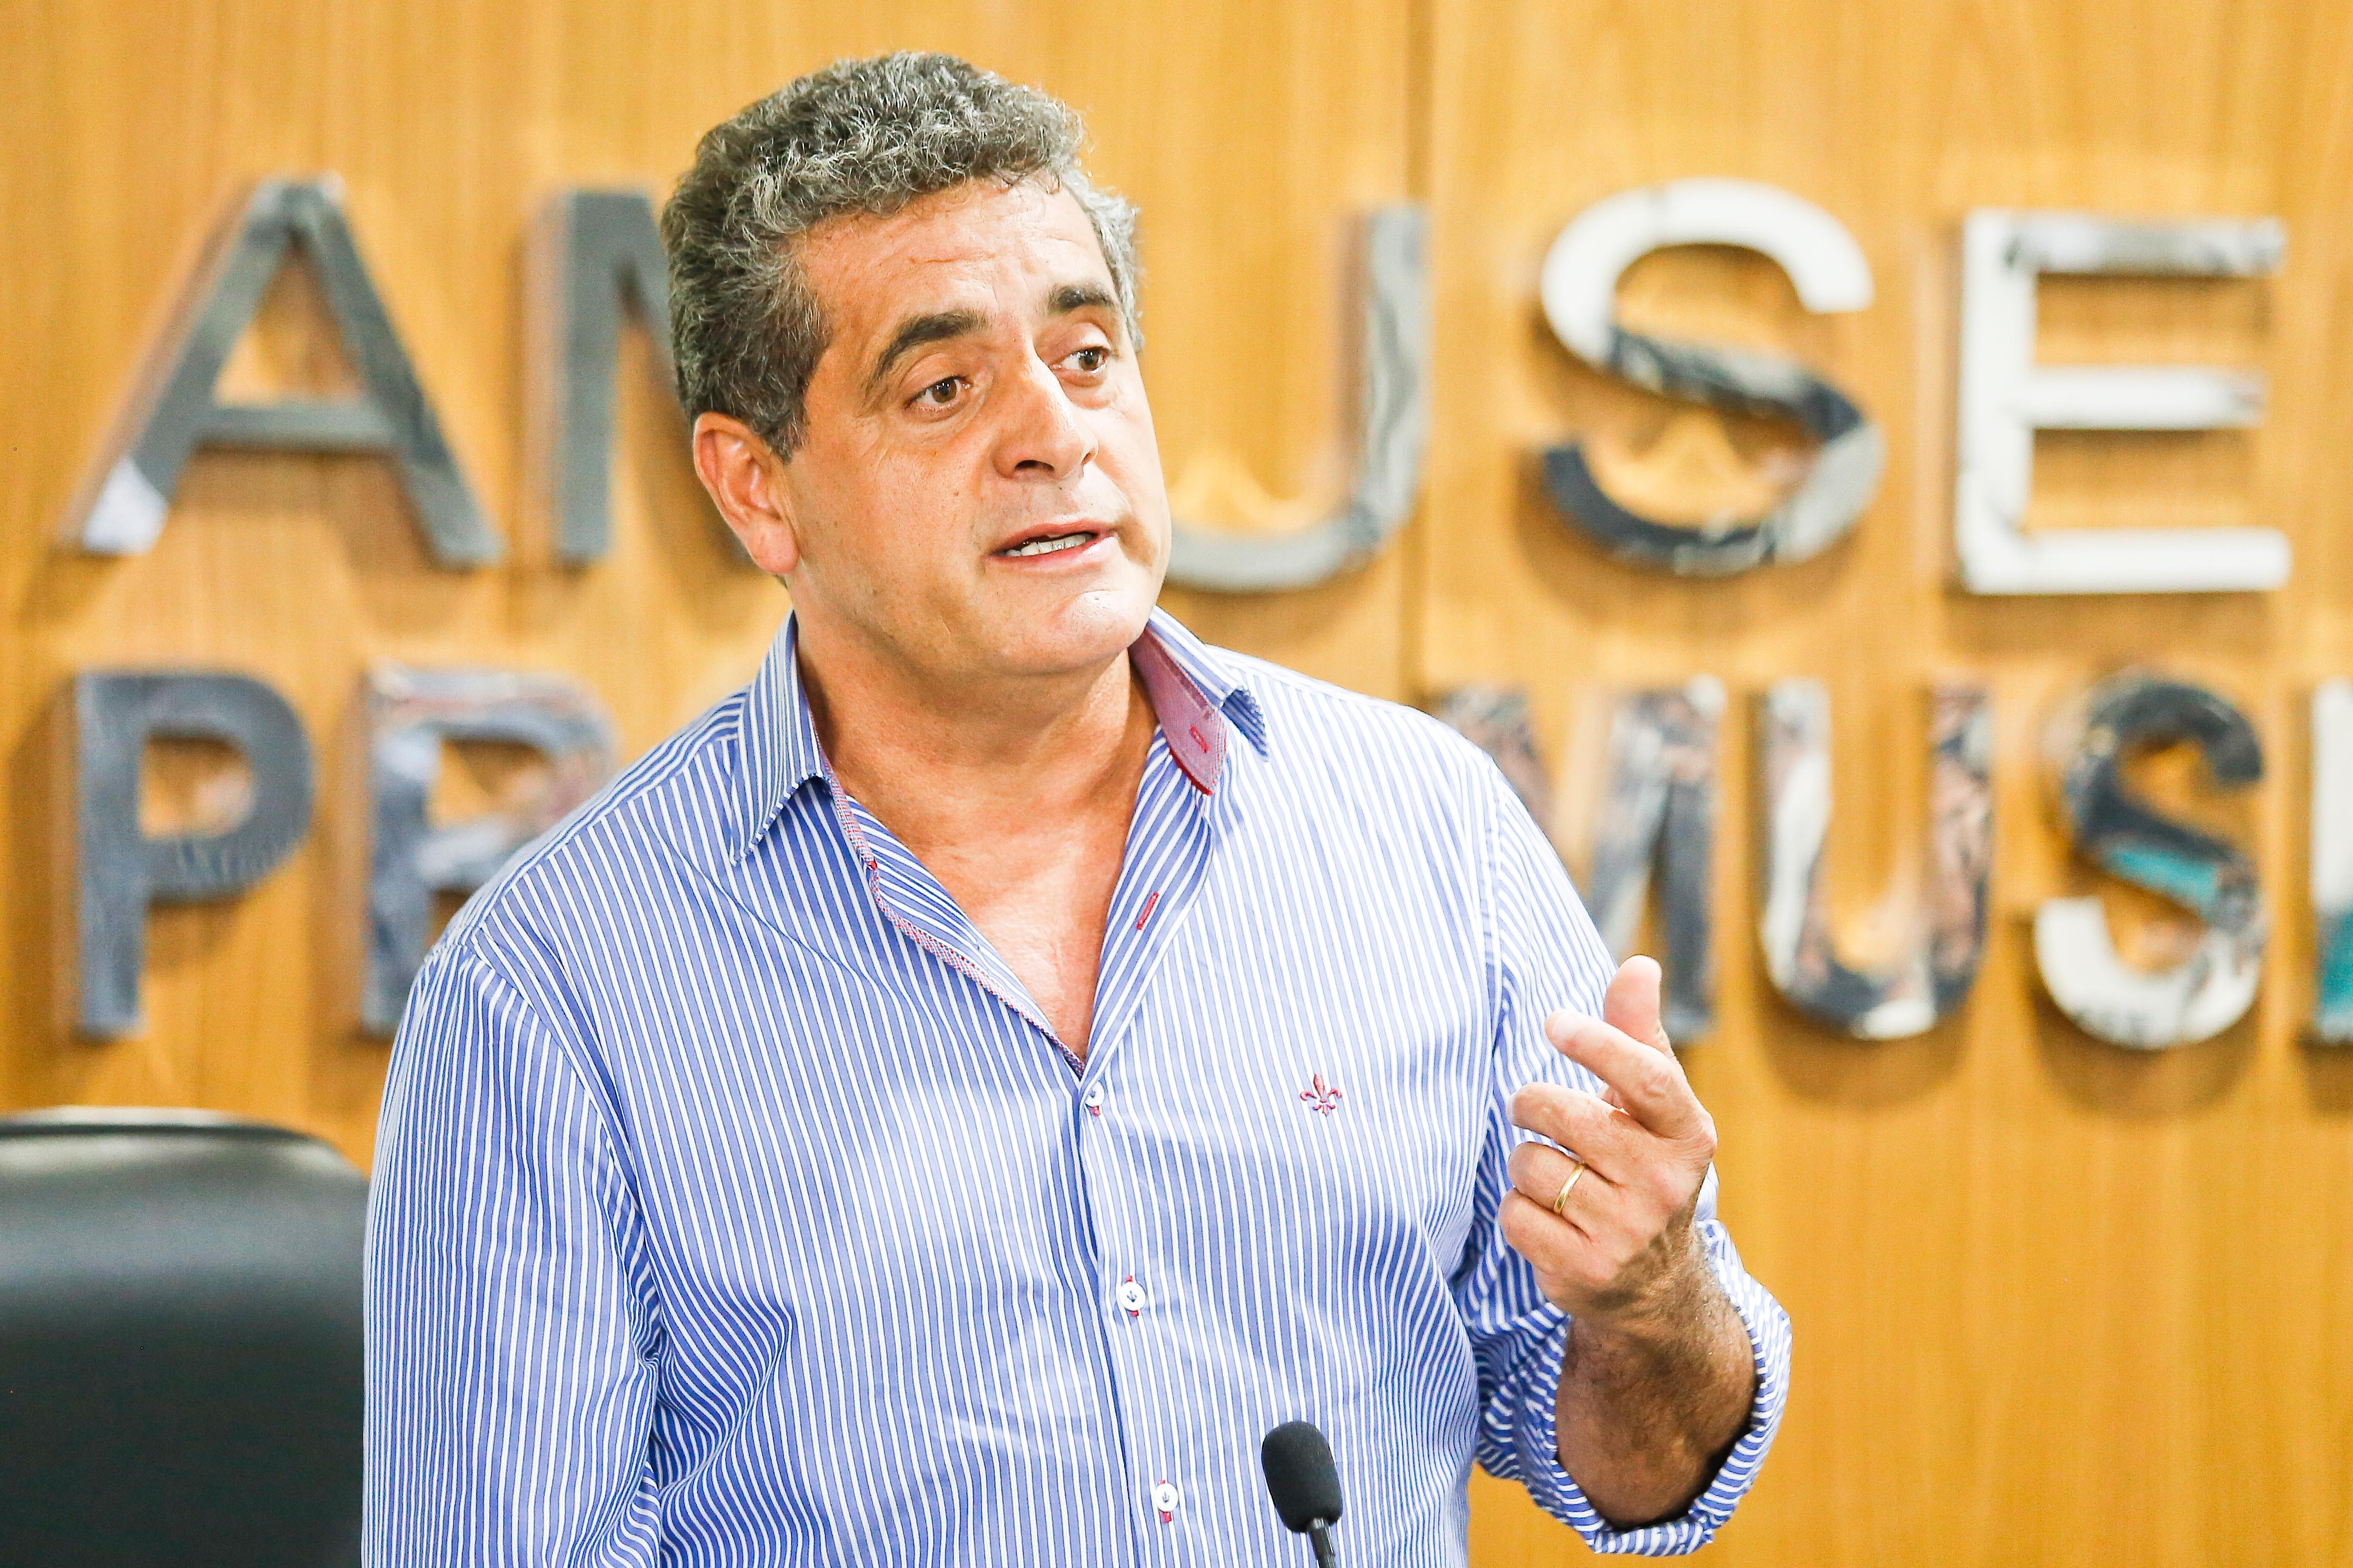 Romualdo Batista, prefeito de Mandaguari, vai concorrer à Presidência, tendo Fernando Brambilla, de Santa Fé, e Rogério Bernardo, de Ângulo, como primeiro e segundo vice-presidente, respectivamente